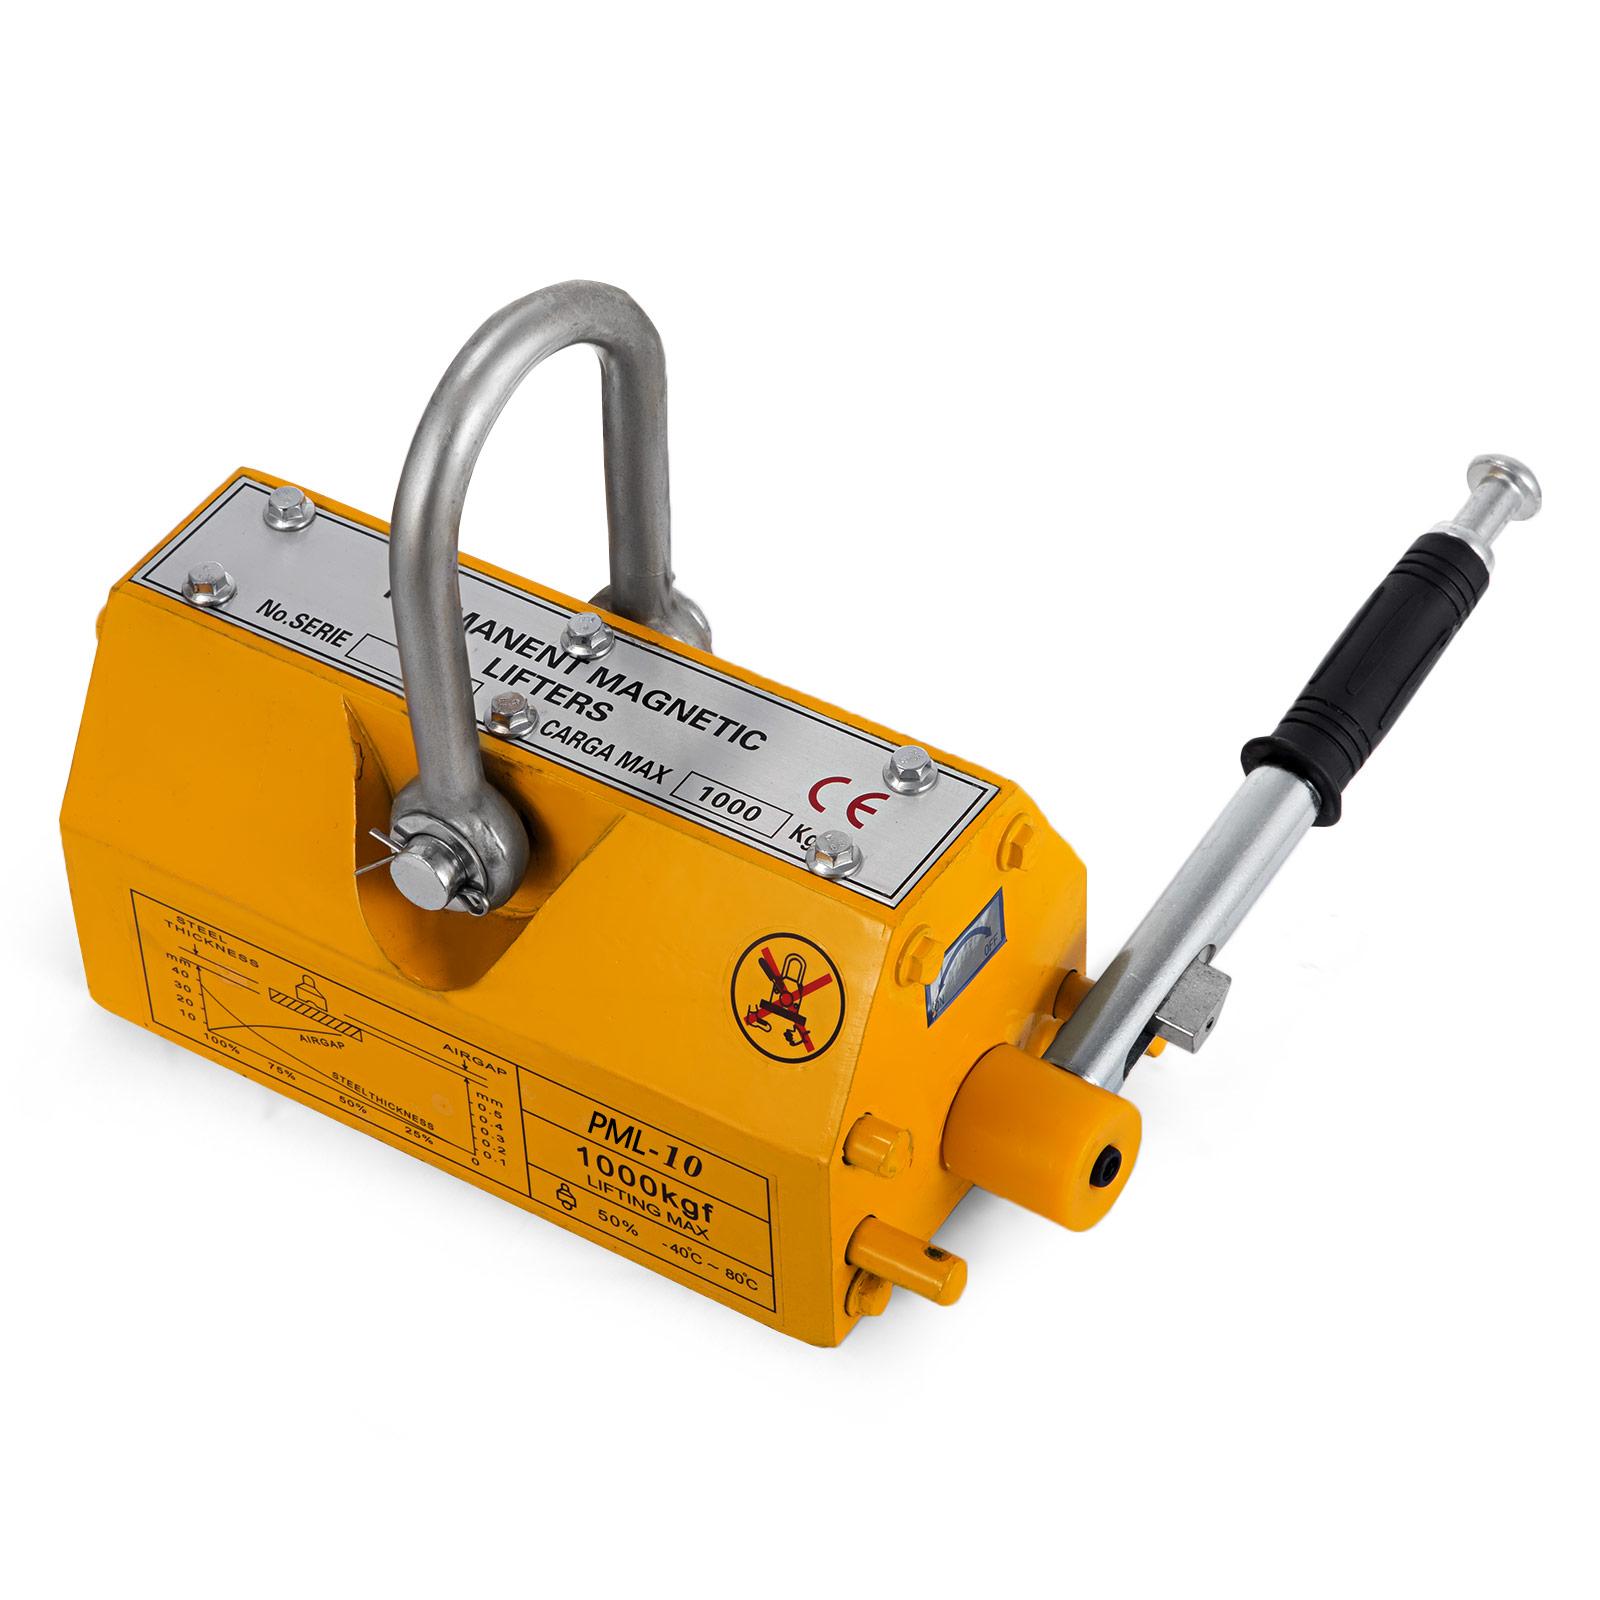 100-300-600-1000KG-Steel-Magnetic-Lifter-Heavy-Duty-Crane-Hoist-Lifting-Magnet miniature 65